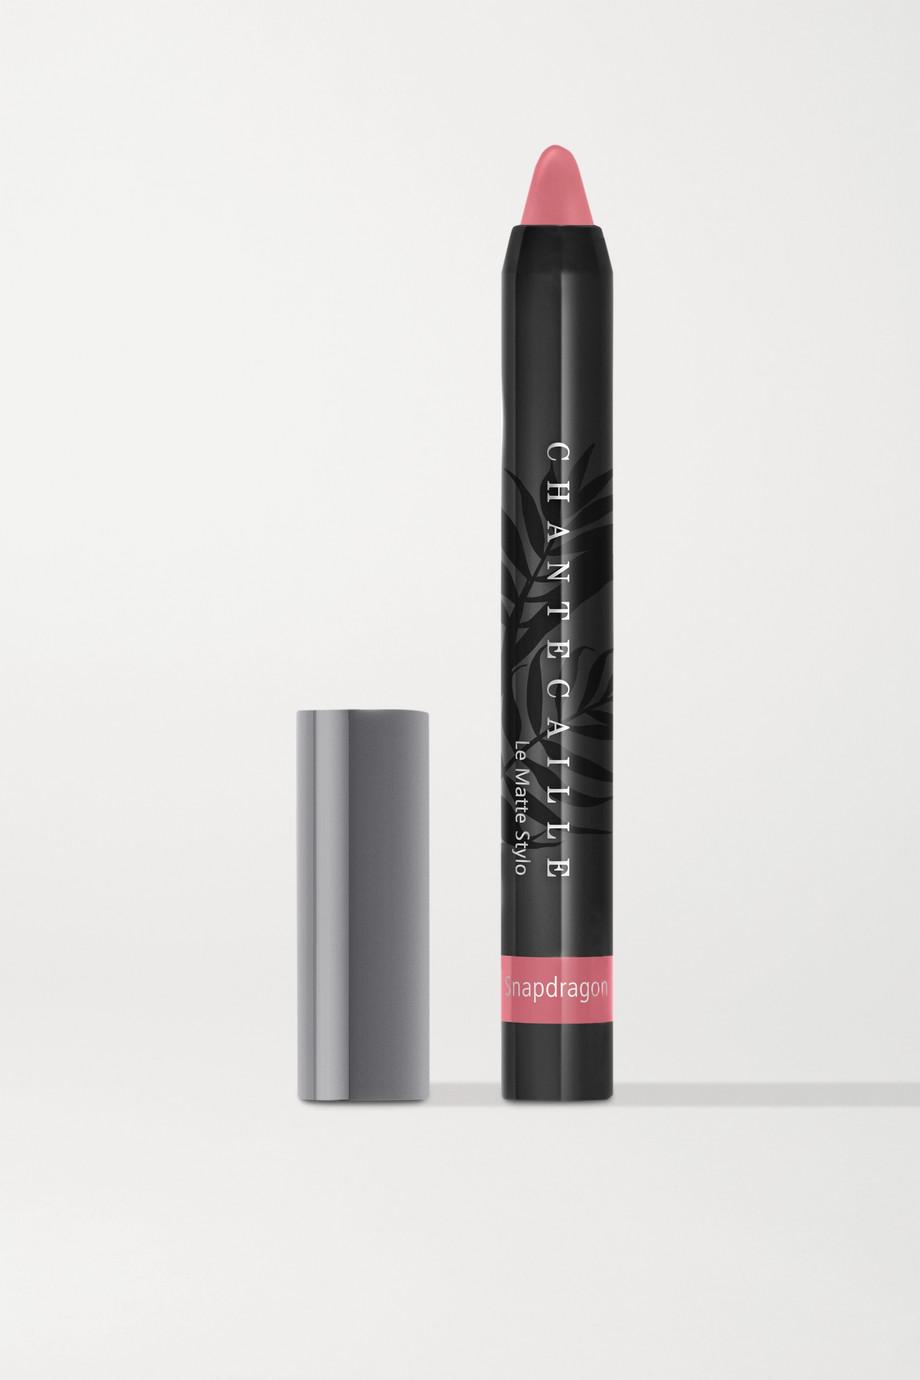 Chantecaille Le Matte Stylo Lip Crayon - Snapdragon